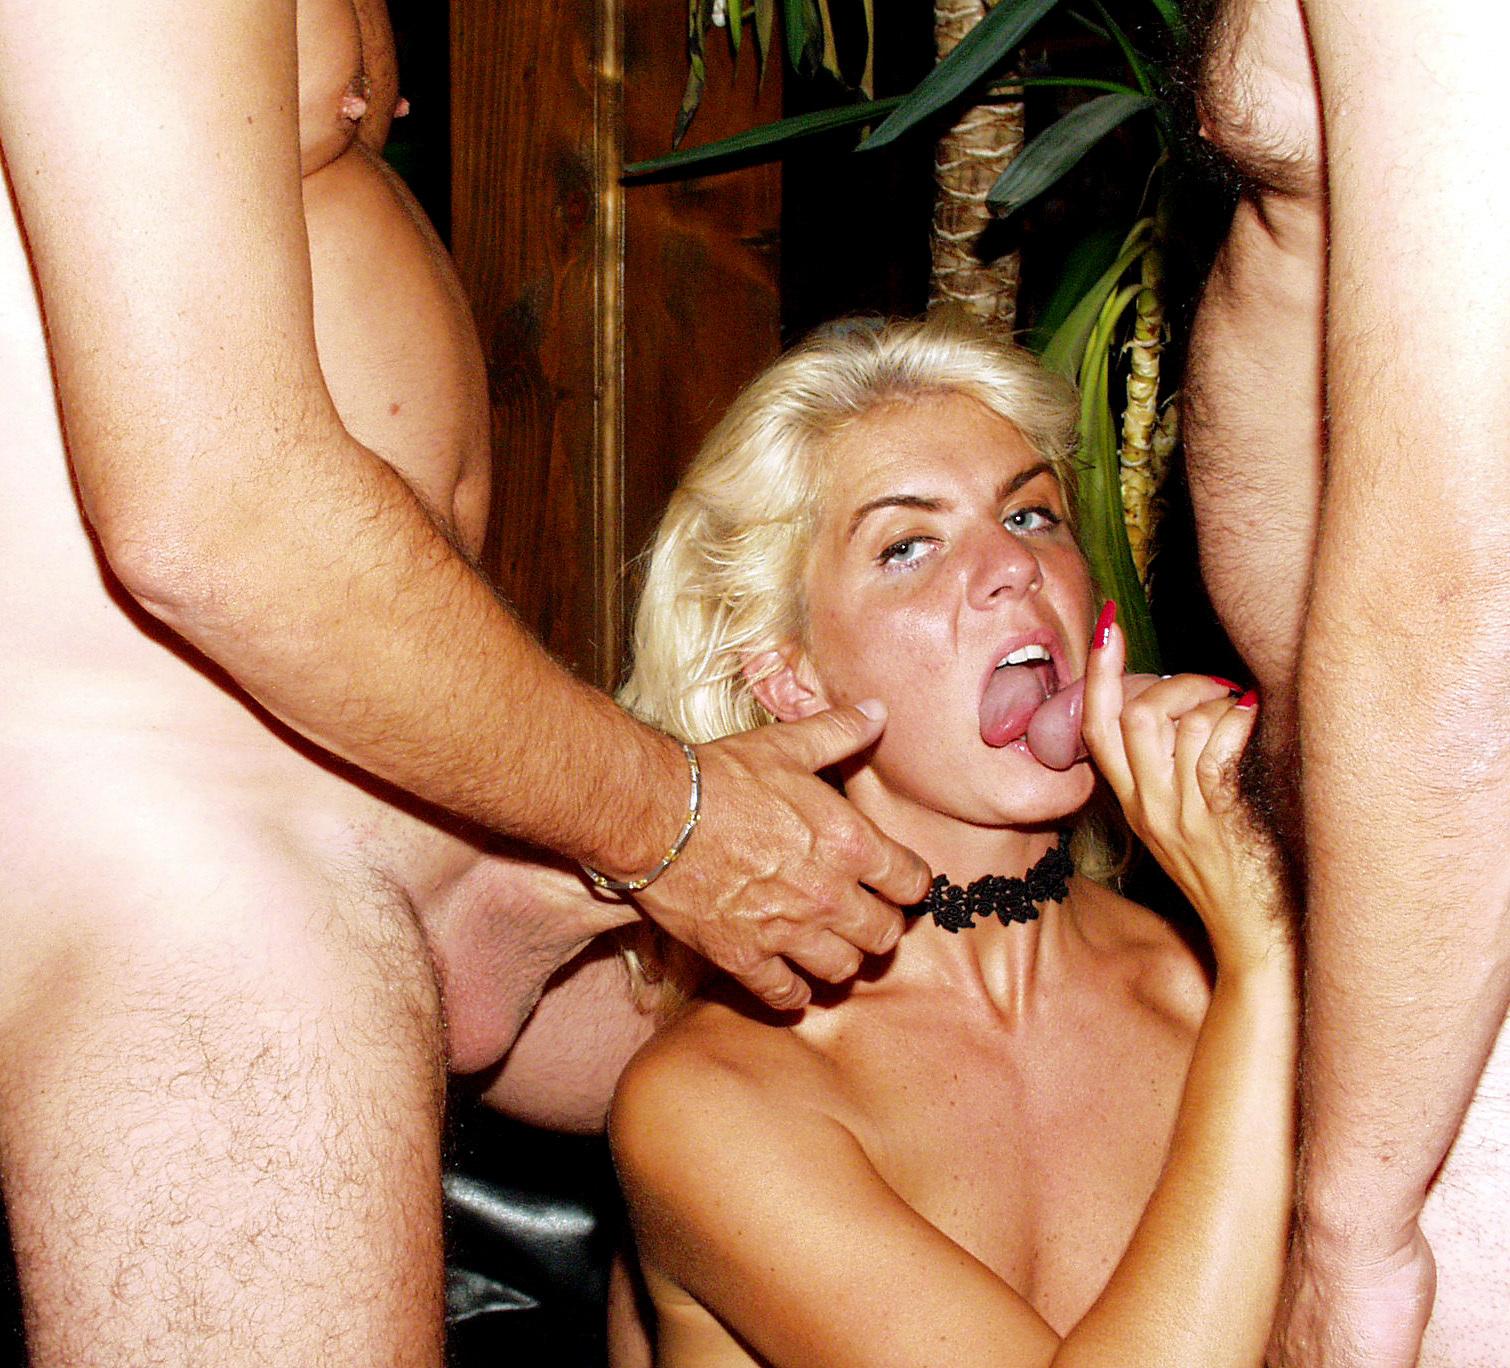 Фото Проституток Францыи